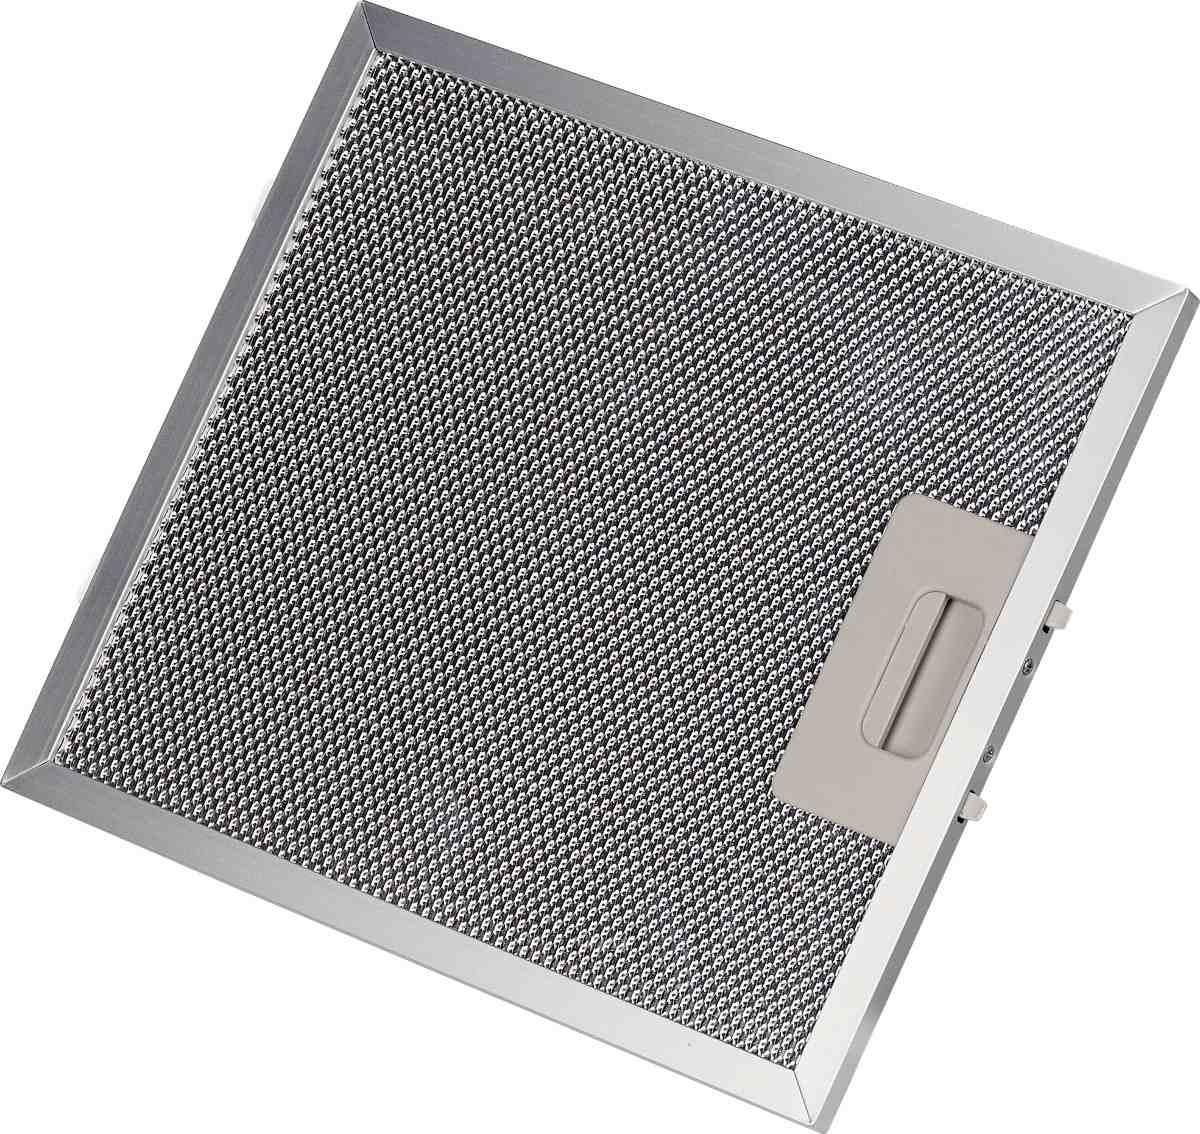 Kit Filtro Alumínio + Filtro Carvão Coifa Tramontina Vetro  - HL SERVICE